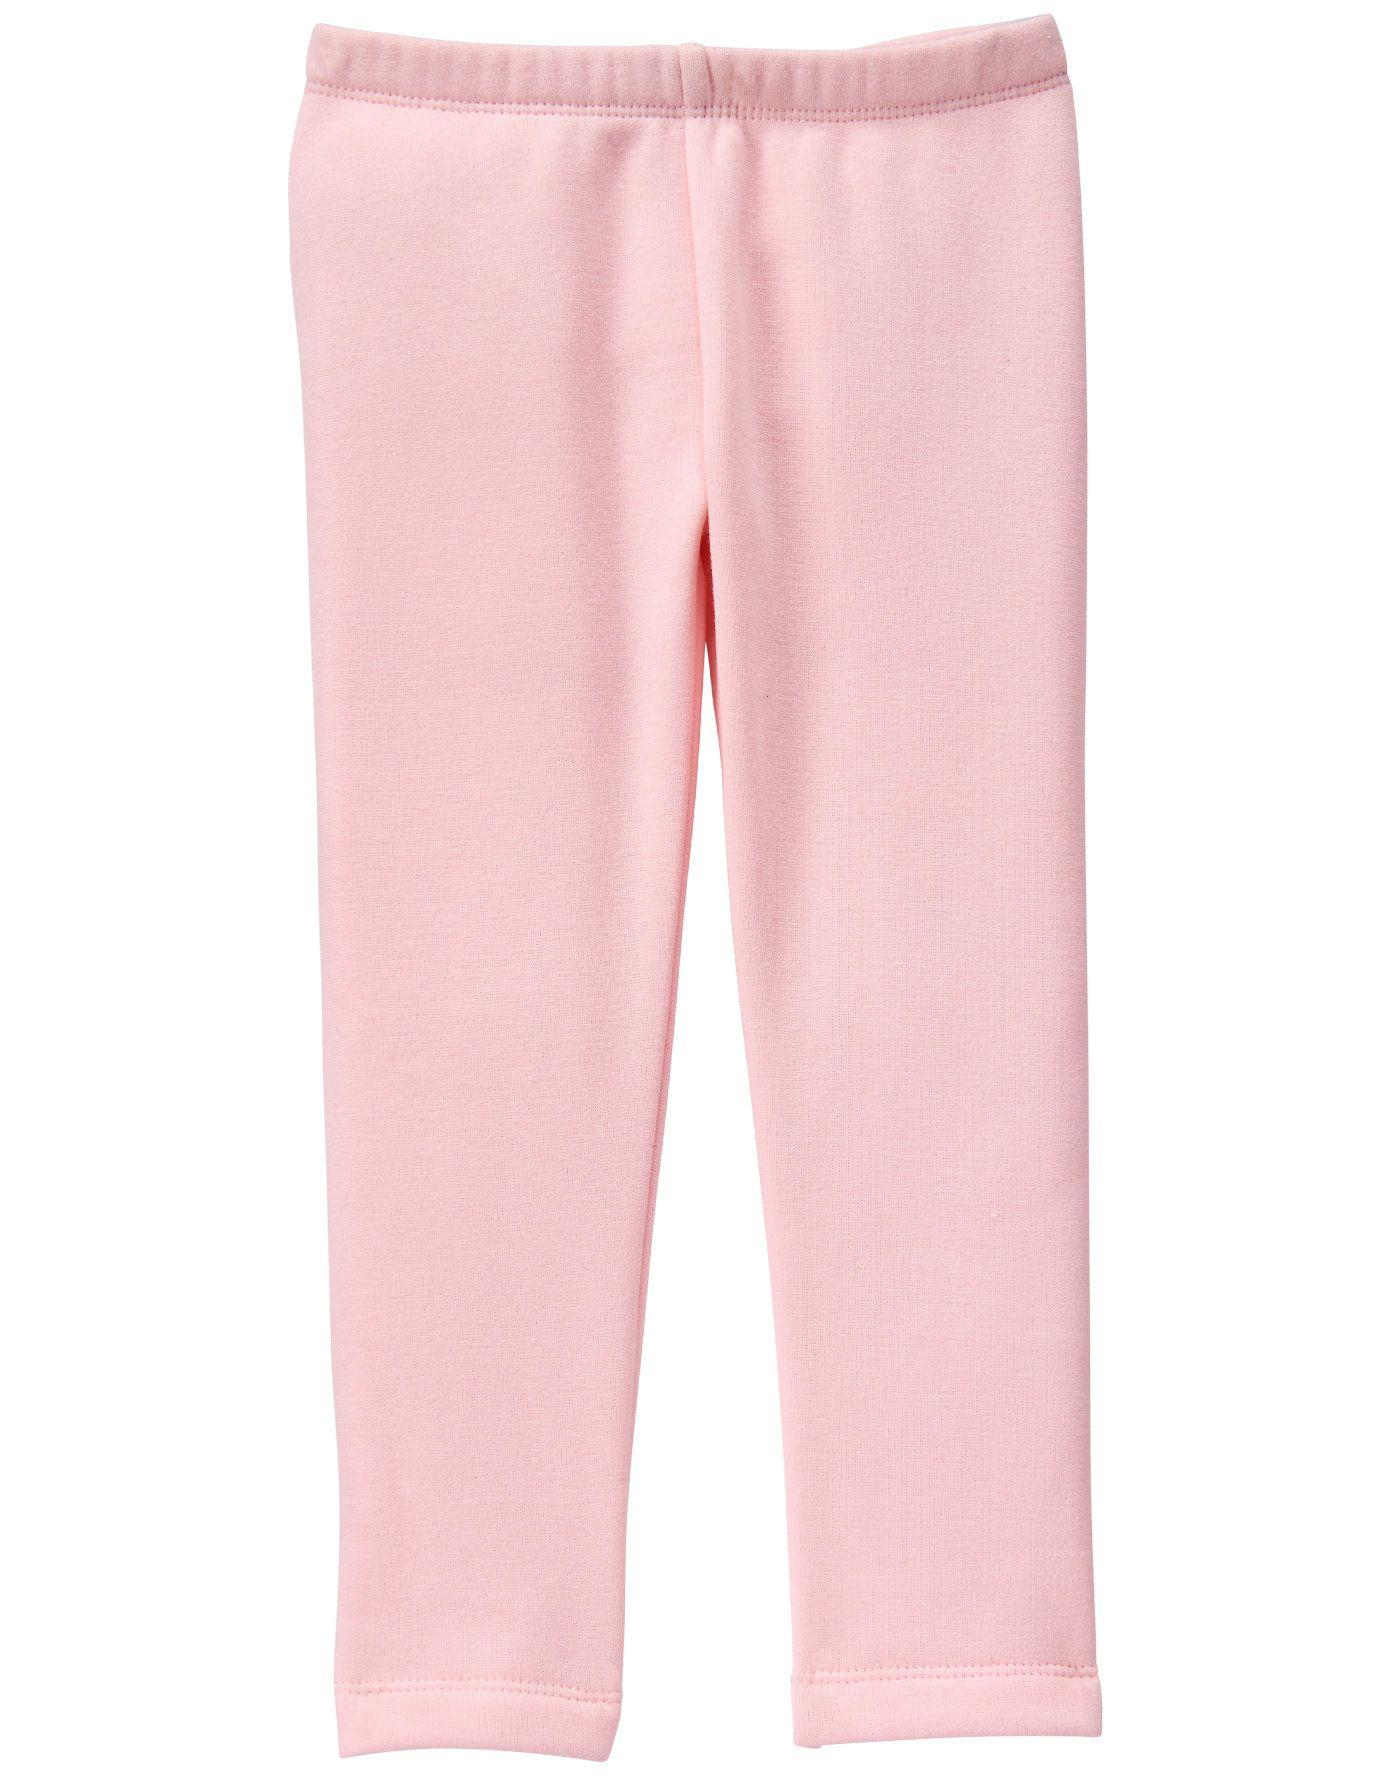 7f62f1b03640a Warm & Fuzzy Leggings | kids fashion-girls | Leggings, Gymboree ...